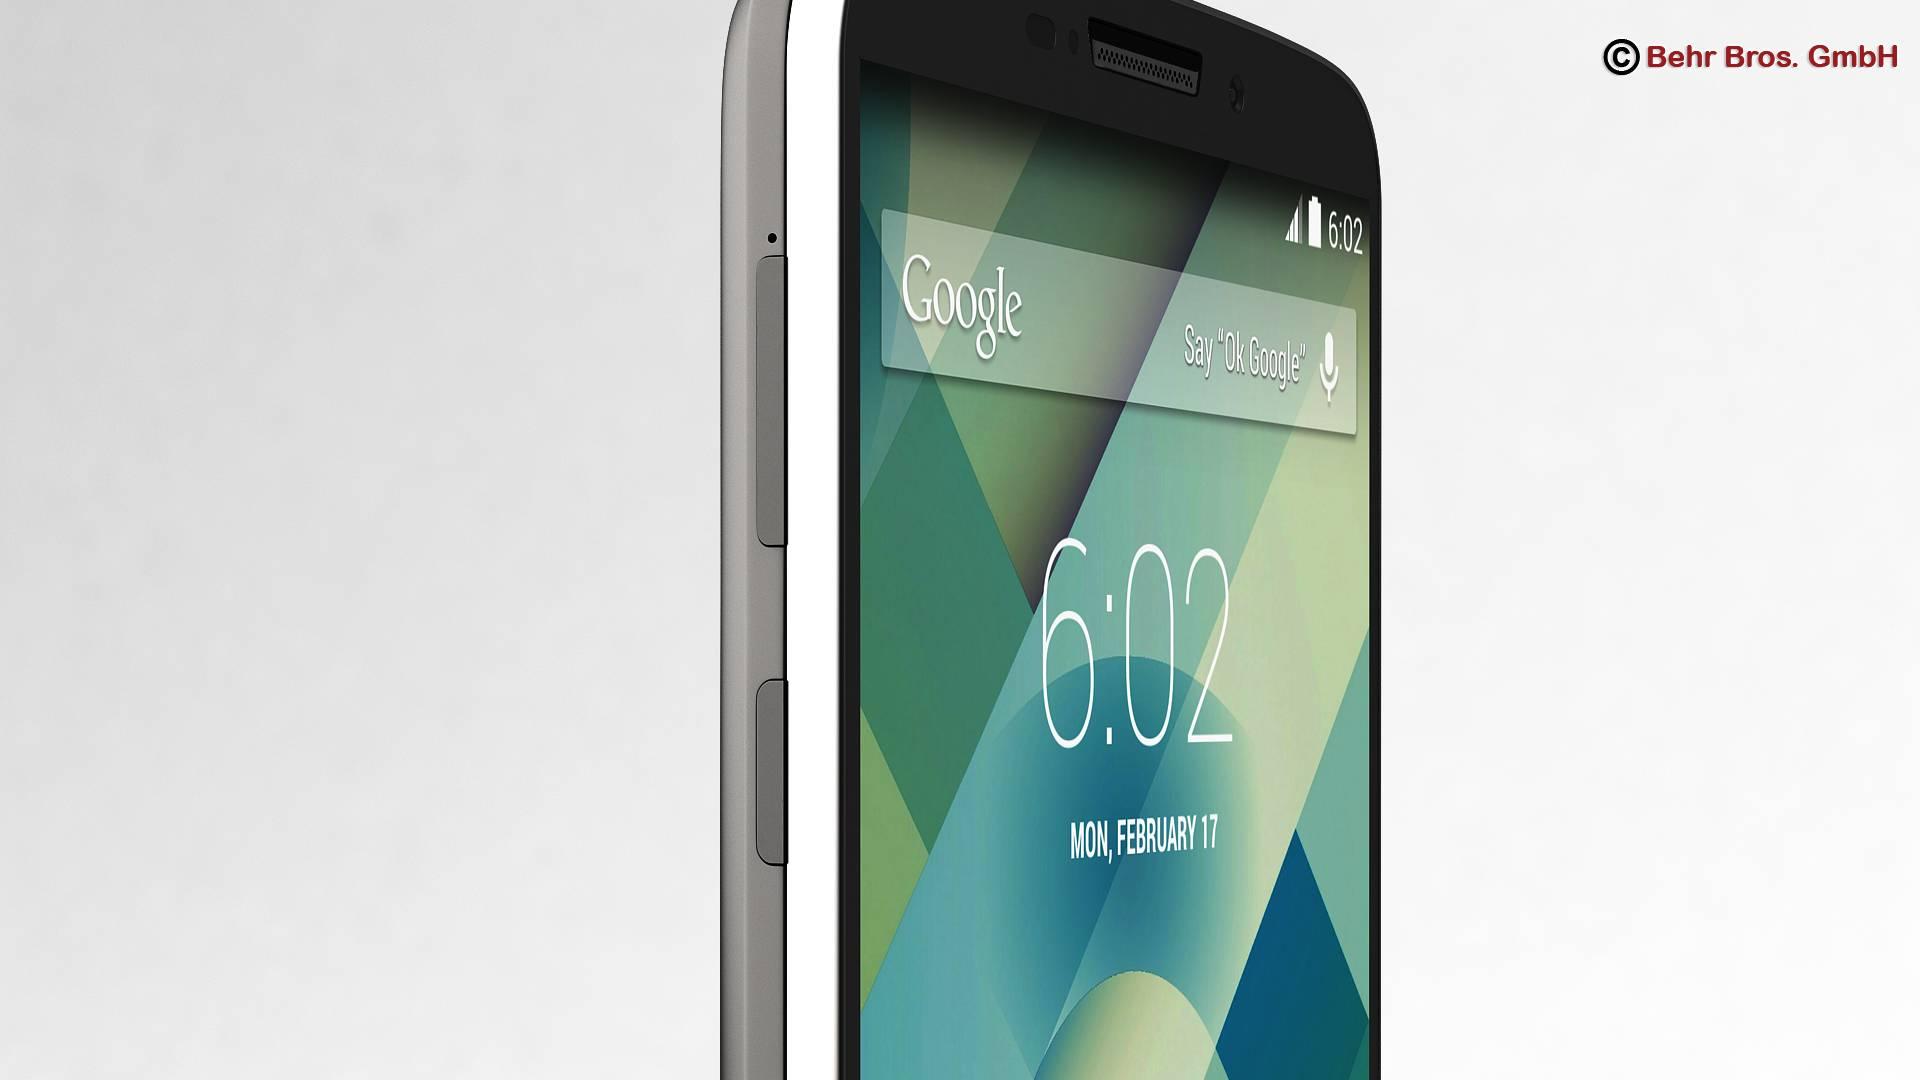 generic smartphone 6 inch 3d model 3ds max fbx c4d lwo ma mb obj 161663